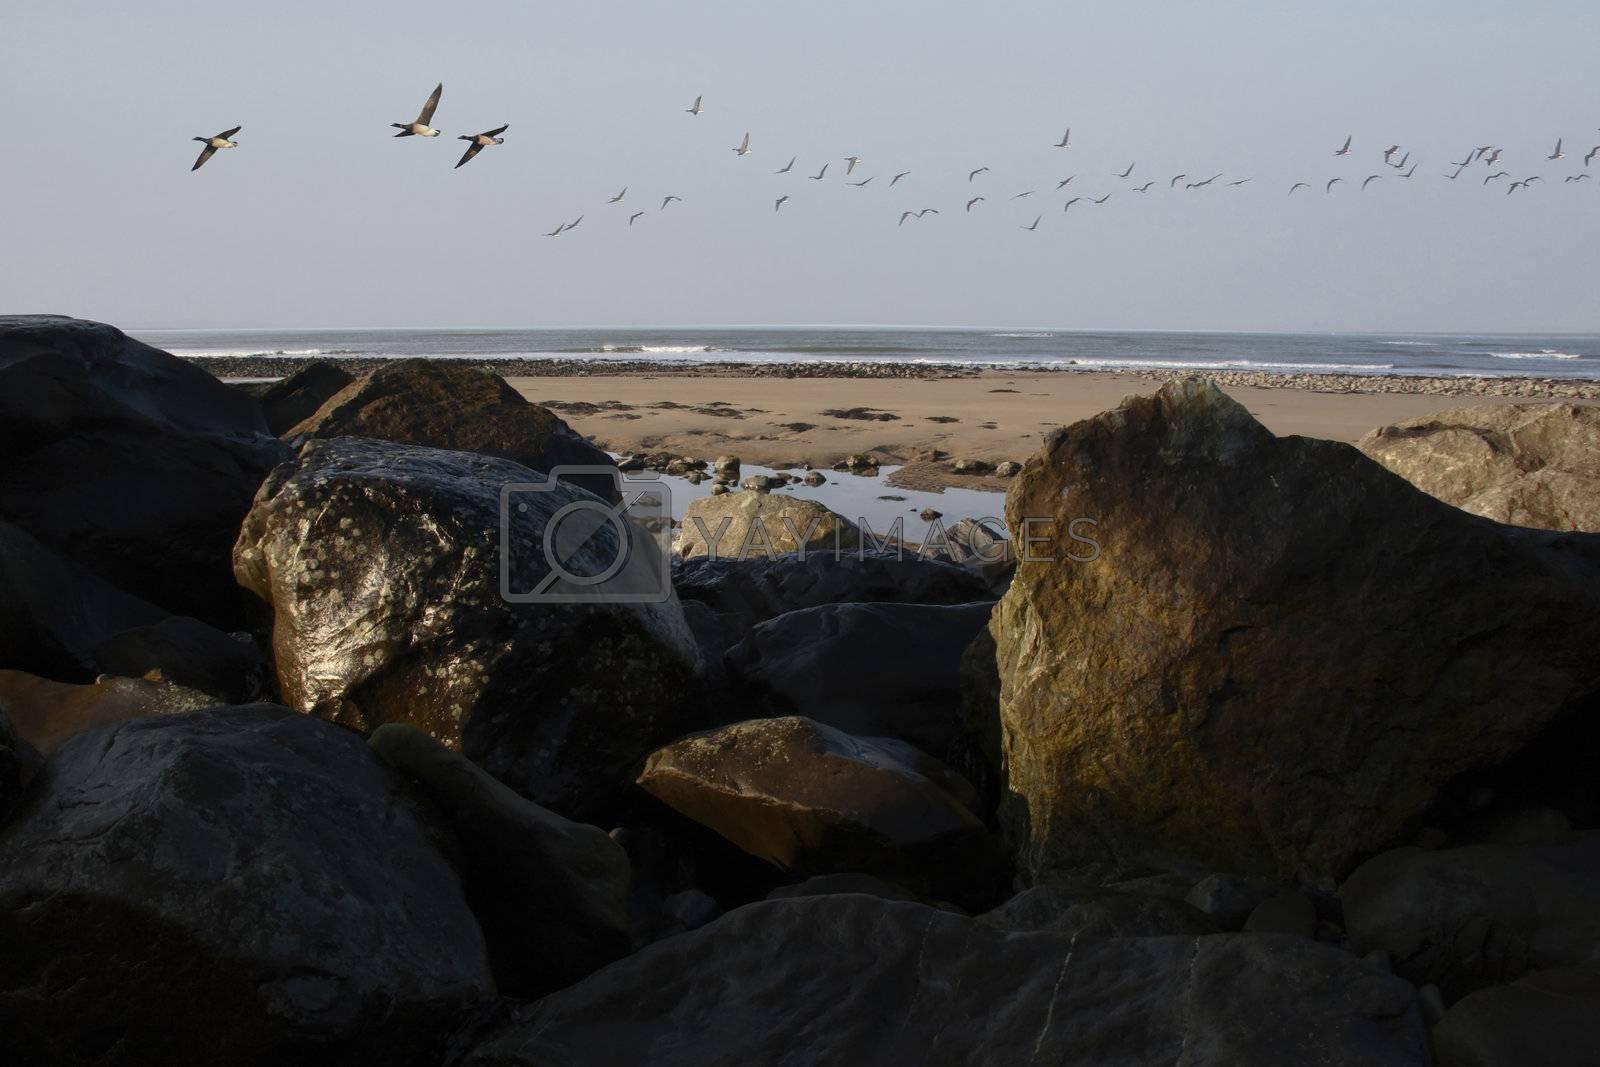 geese flight in kerry ireland